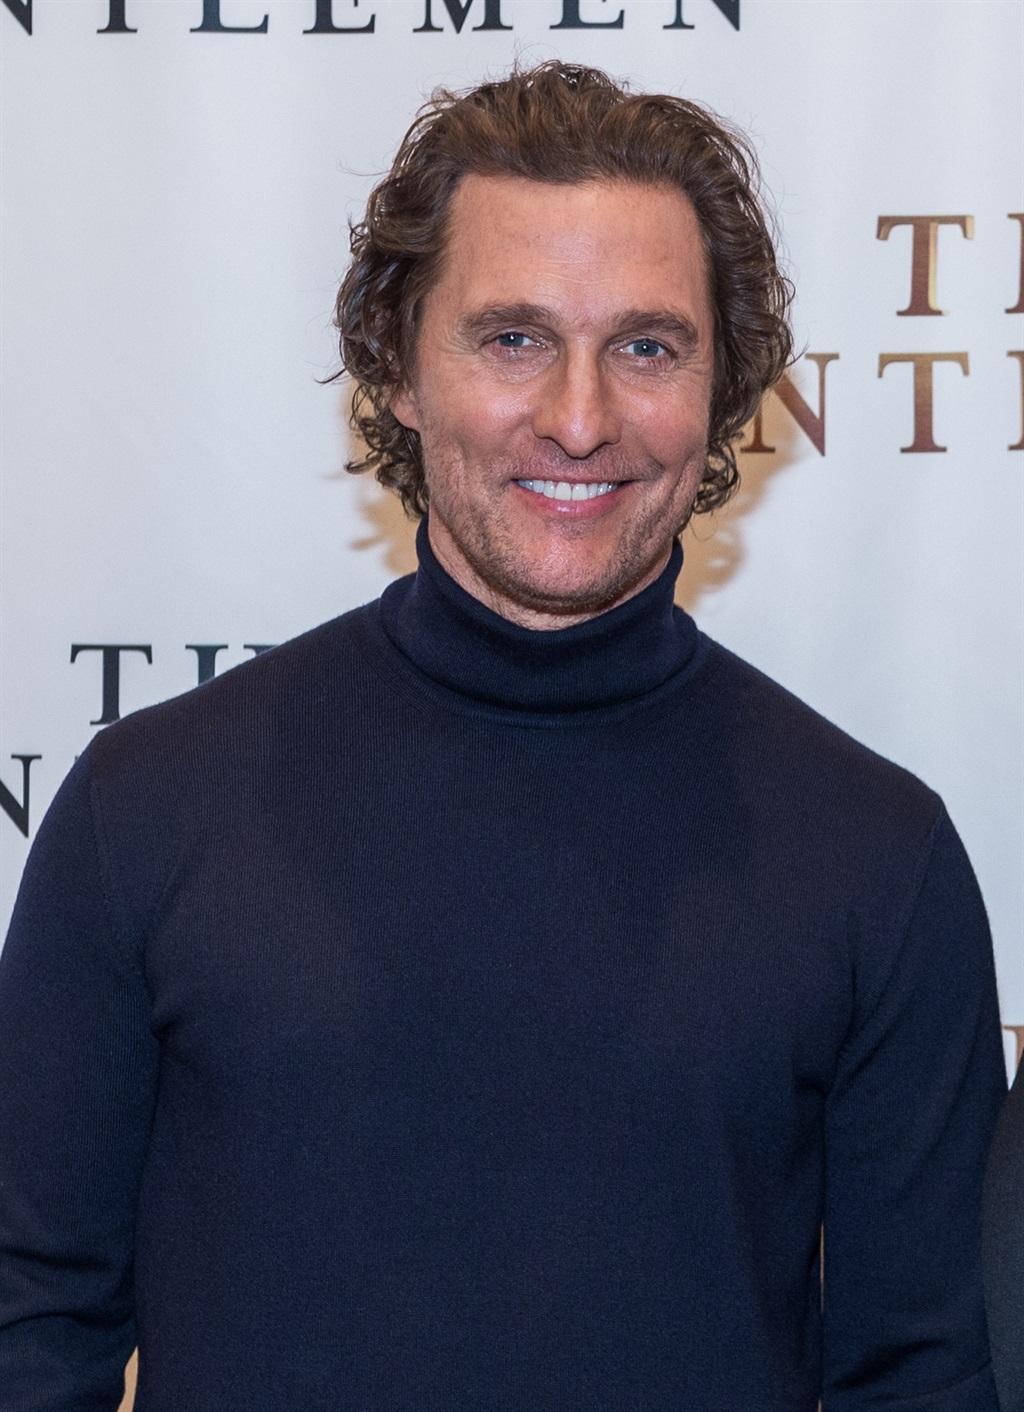 Matthew McConaughey. Foto: Gallo Images/Getty Imag